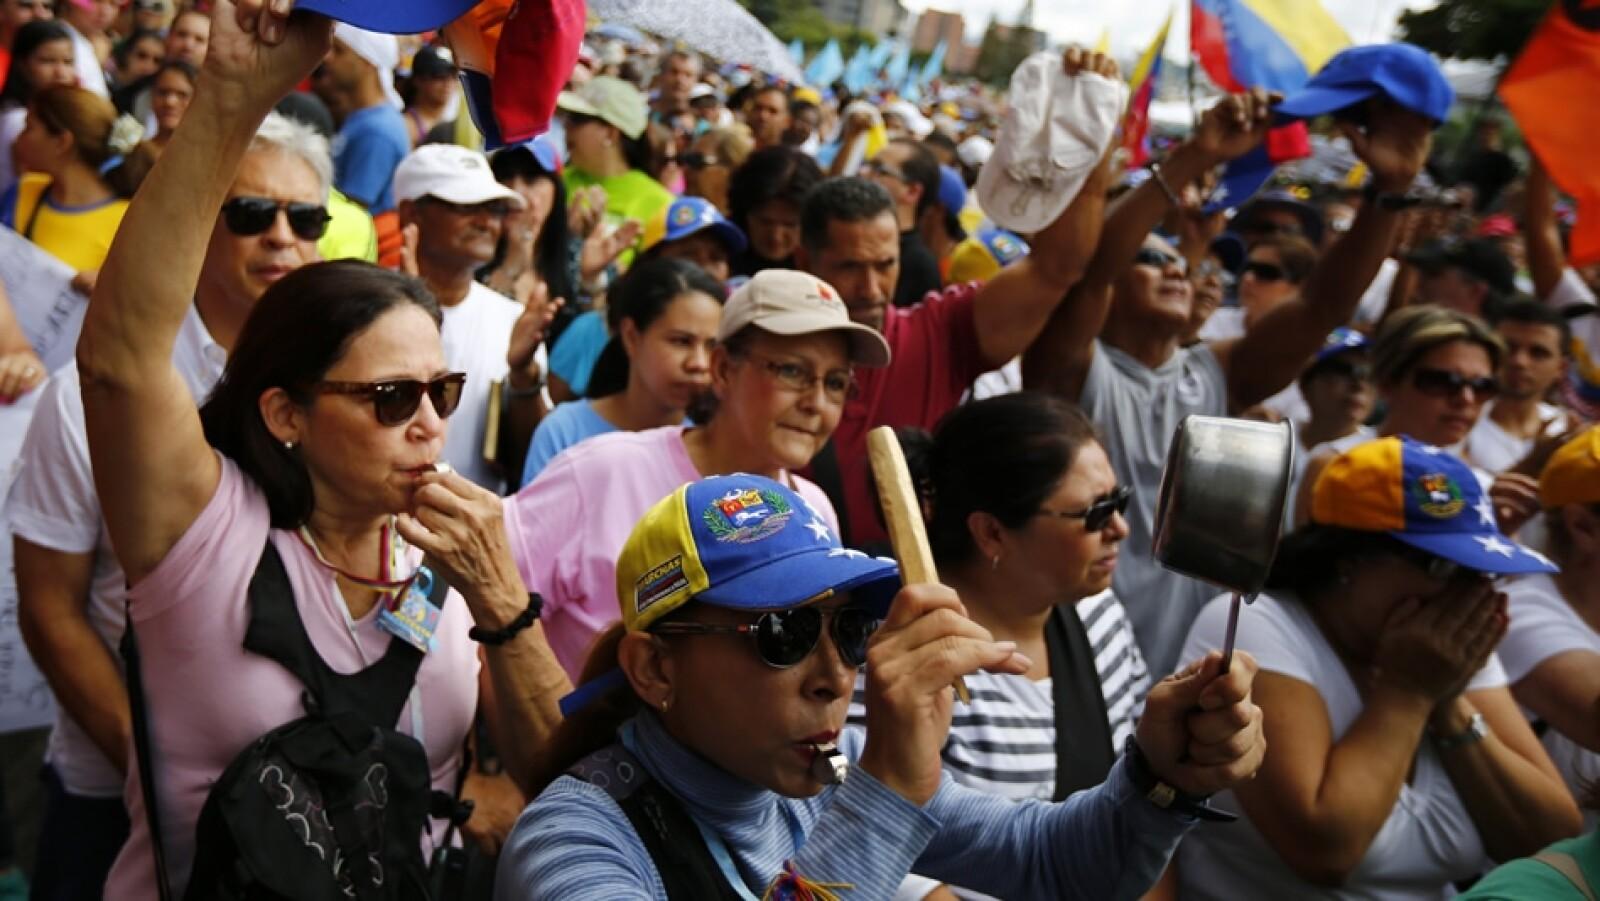 Venezuela opositores Maduro manifestacion